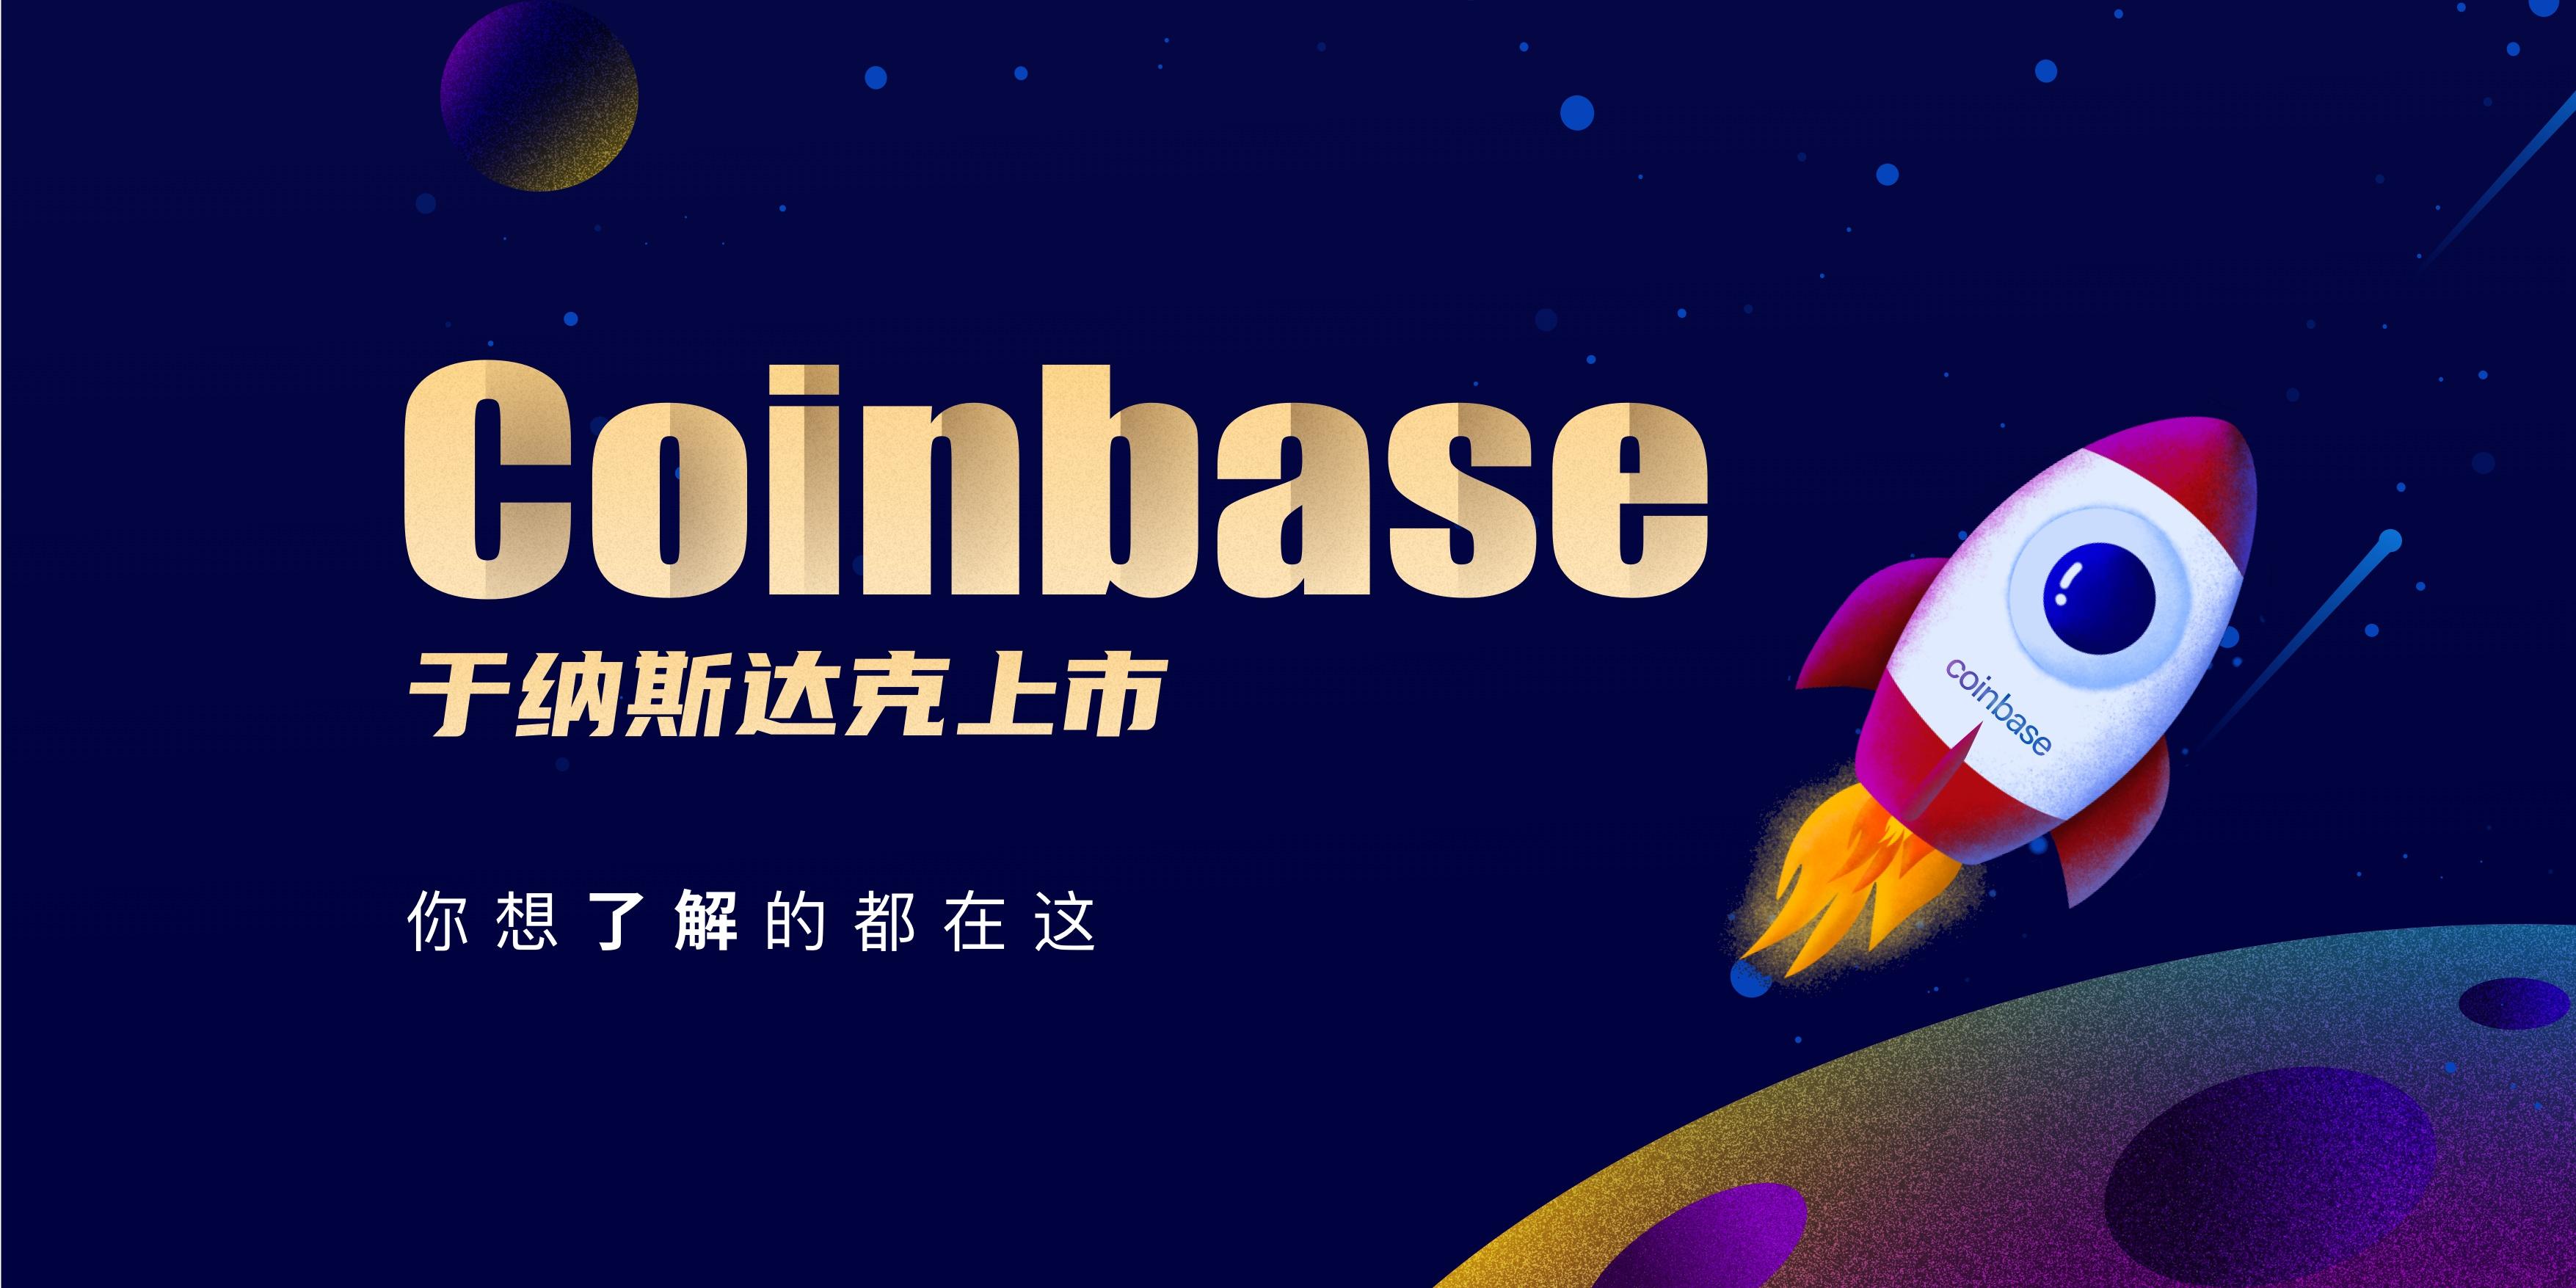 Coinbase第一季度净利润近8亿美元 将于4月14日纳斯达克上市